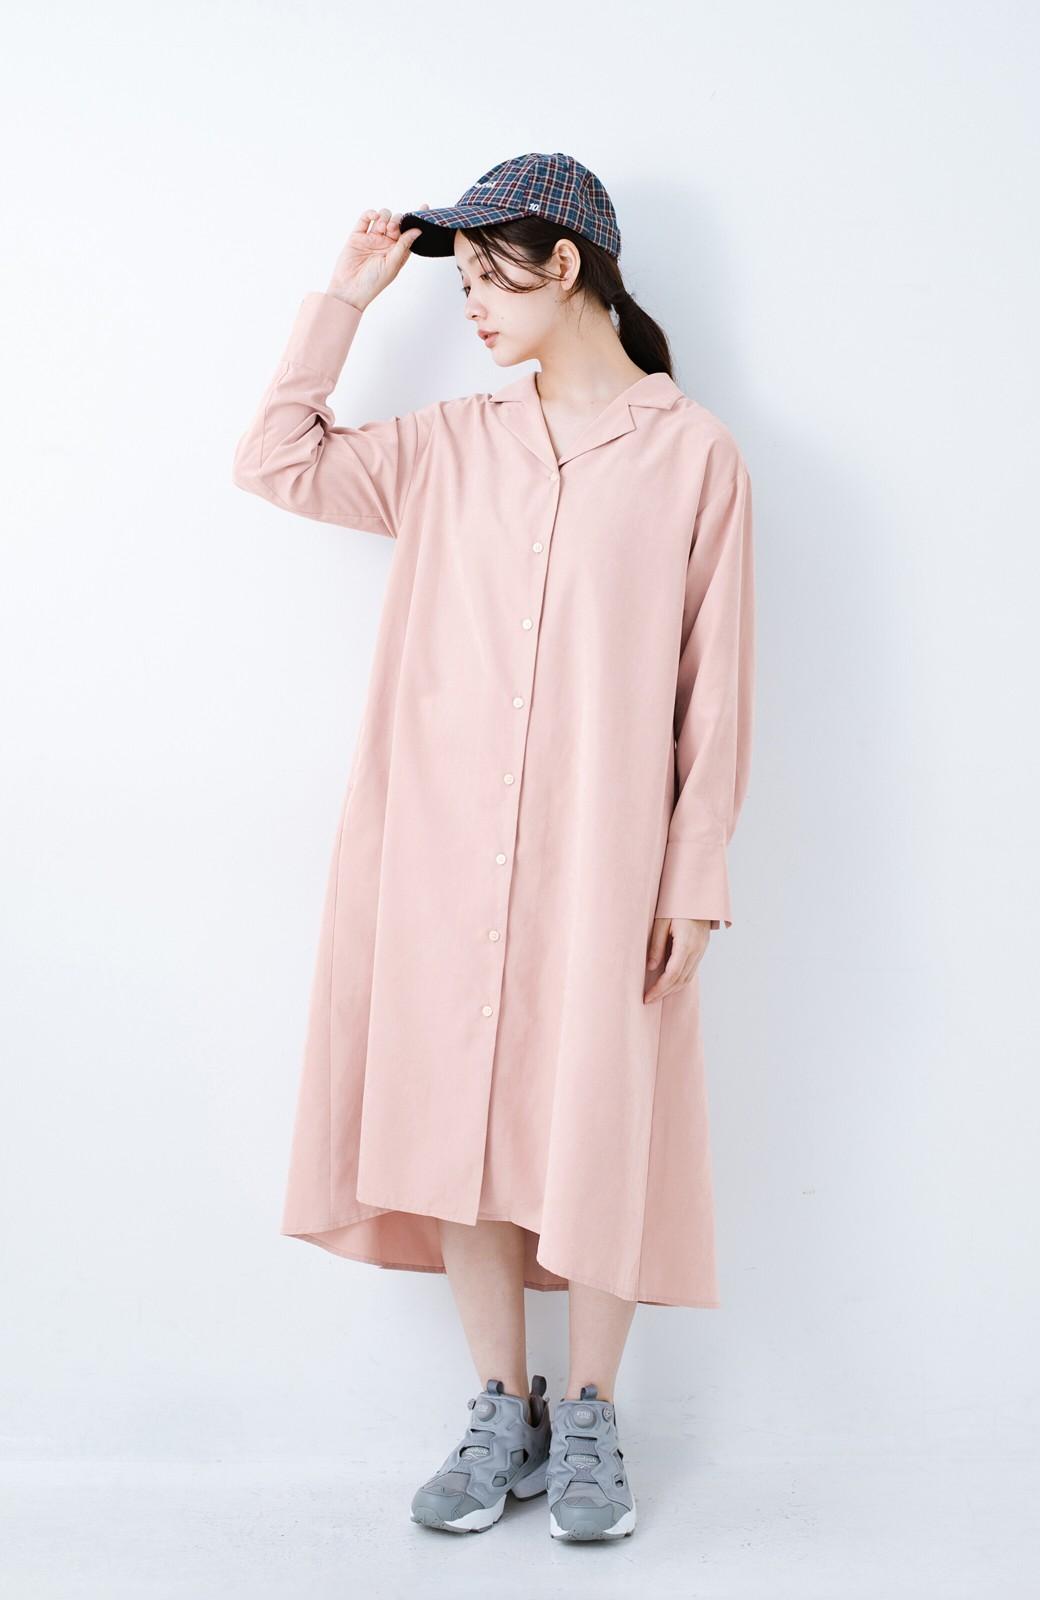 haco! 太ってもばれずに羽織っても便利なAラインワンピース <ピンク>の商品写真4